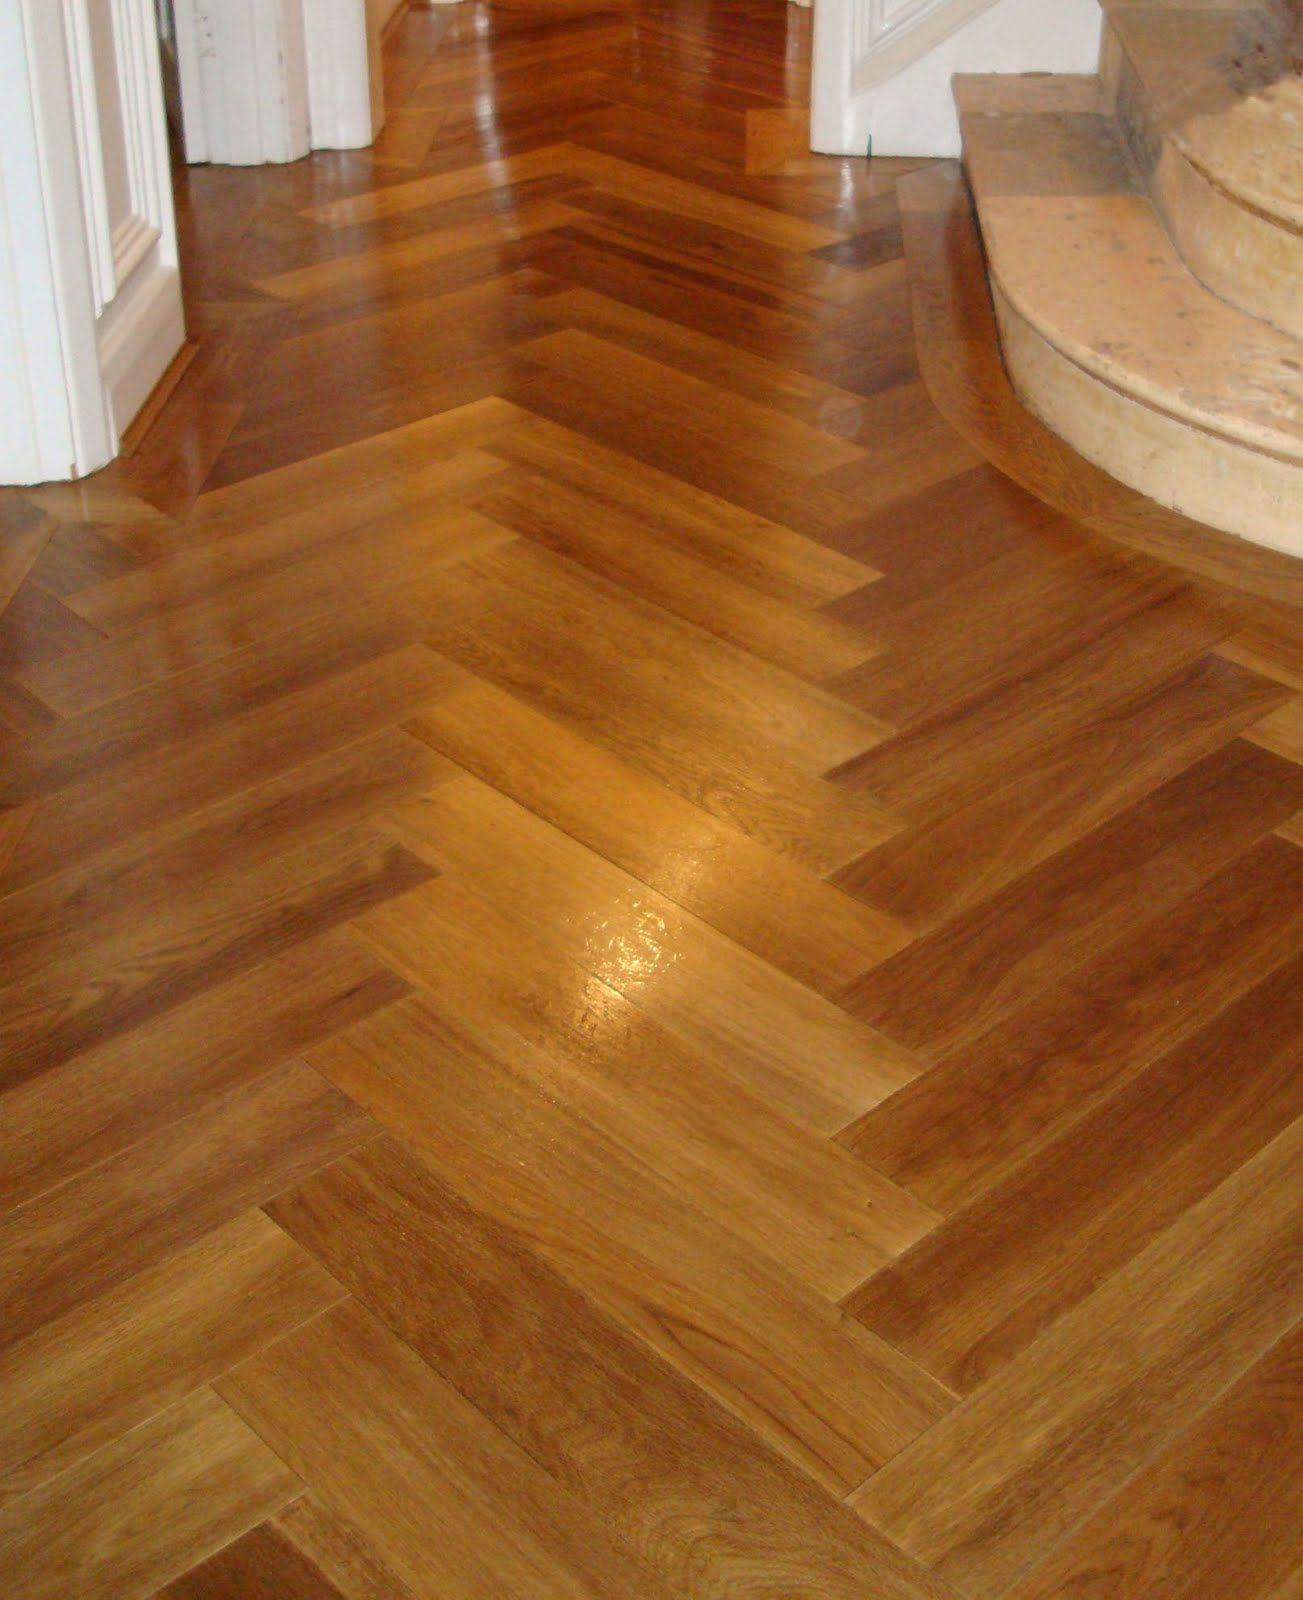 wooden floor design wood flooring ideas | wood floor,wood floor design,wood floor design ideas WAJPJIY